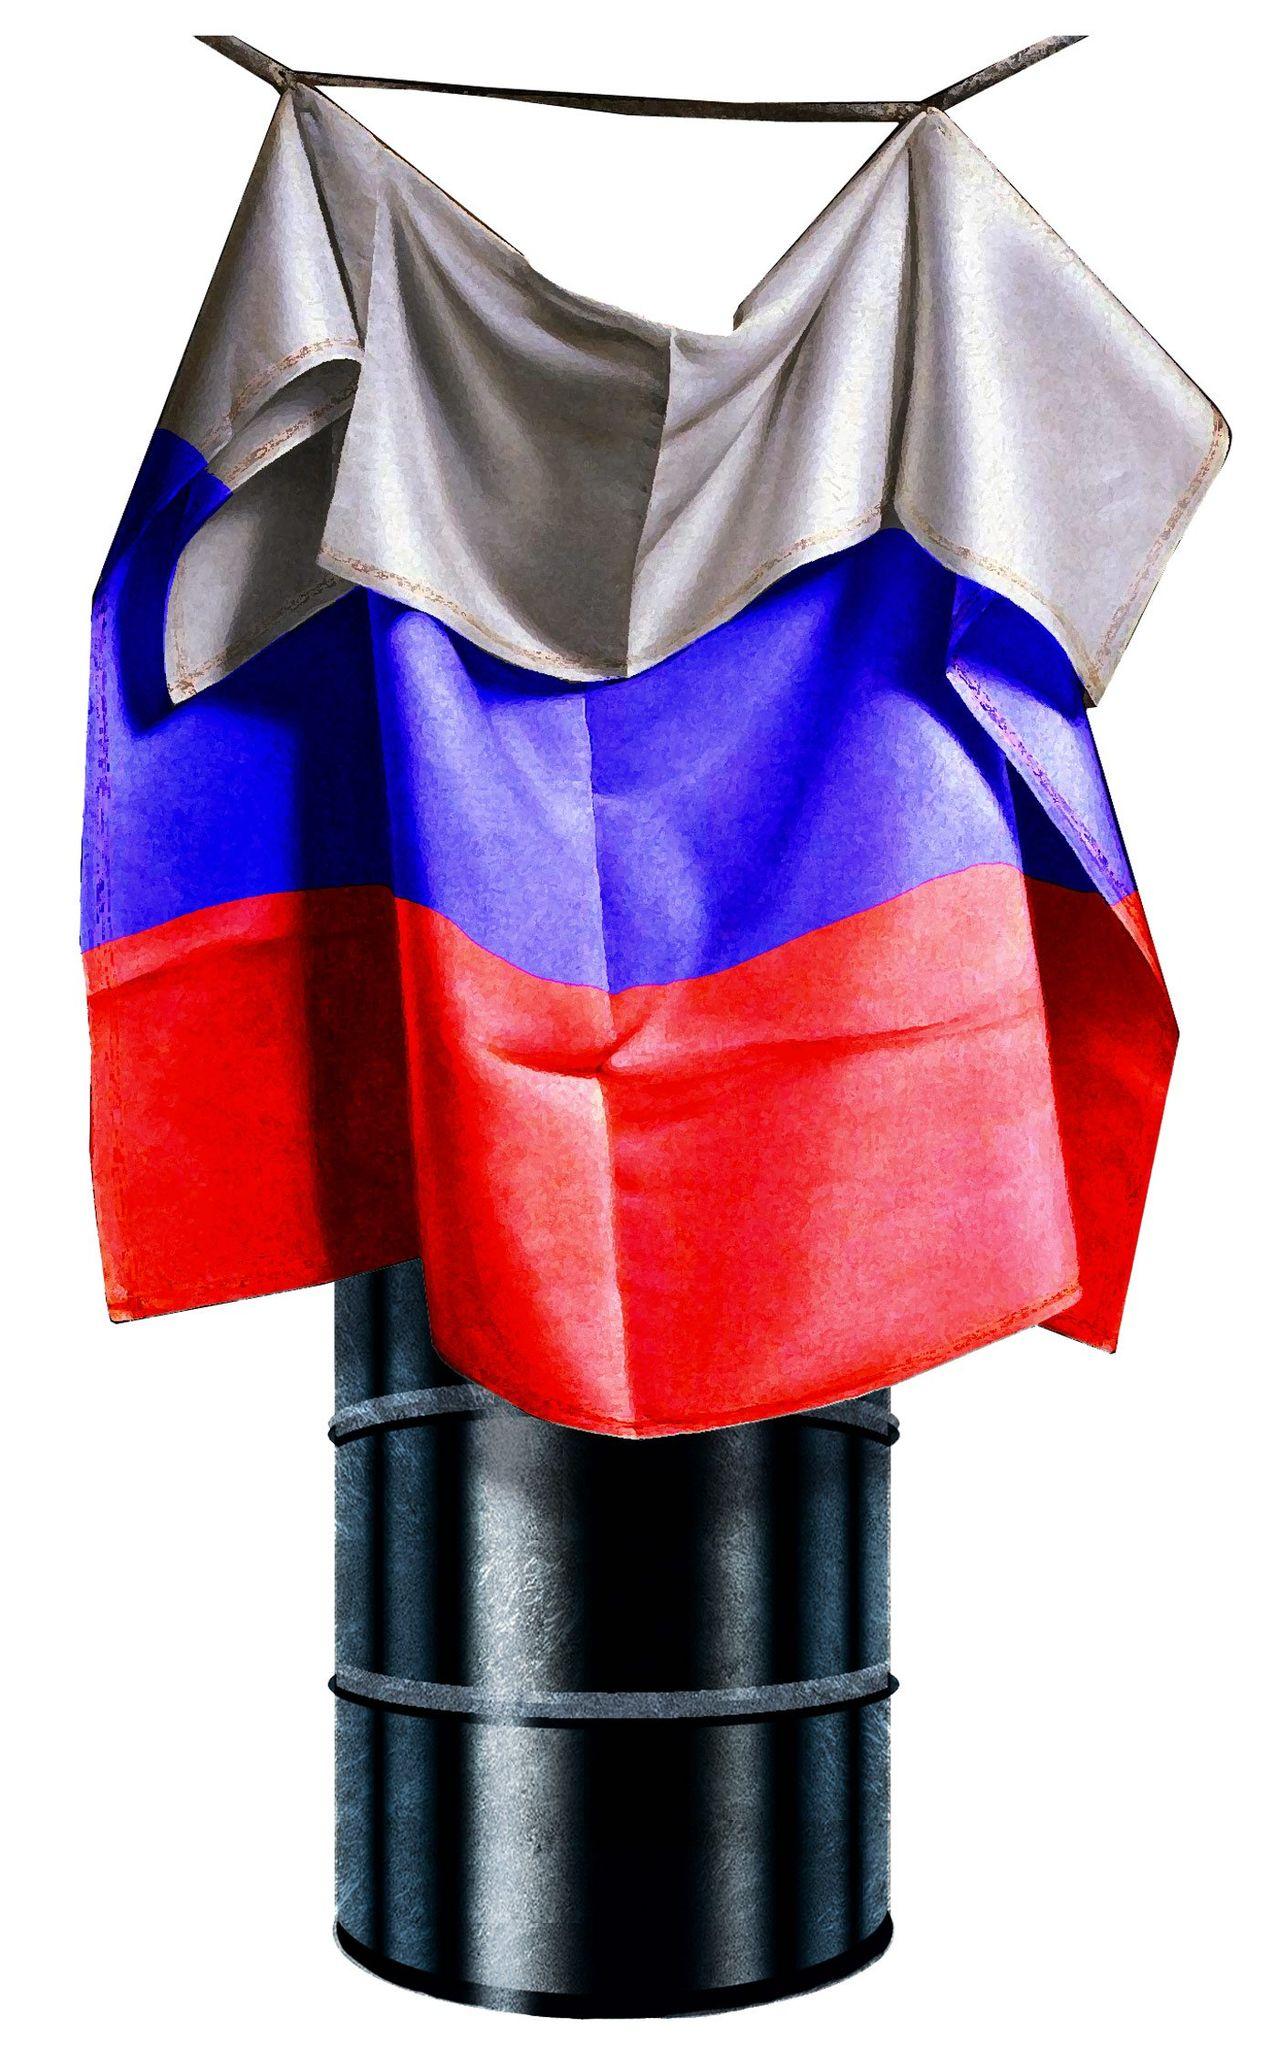 Vladimir Putin's real target: The world's oil supply